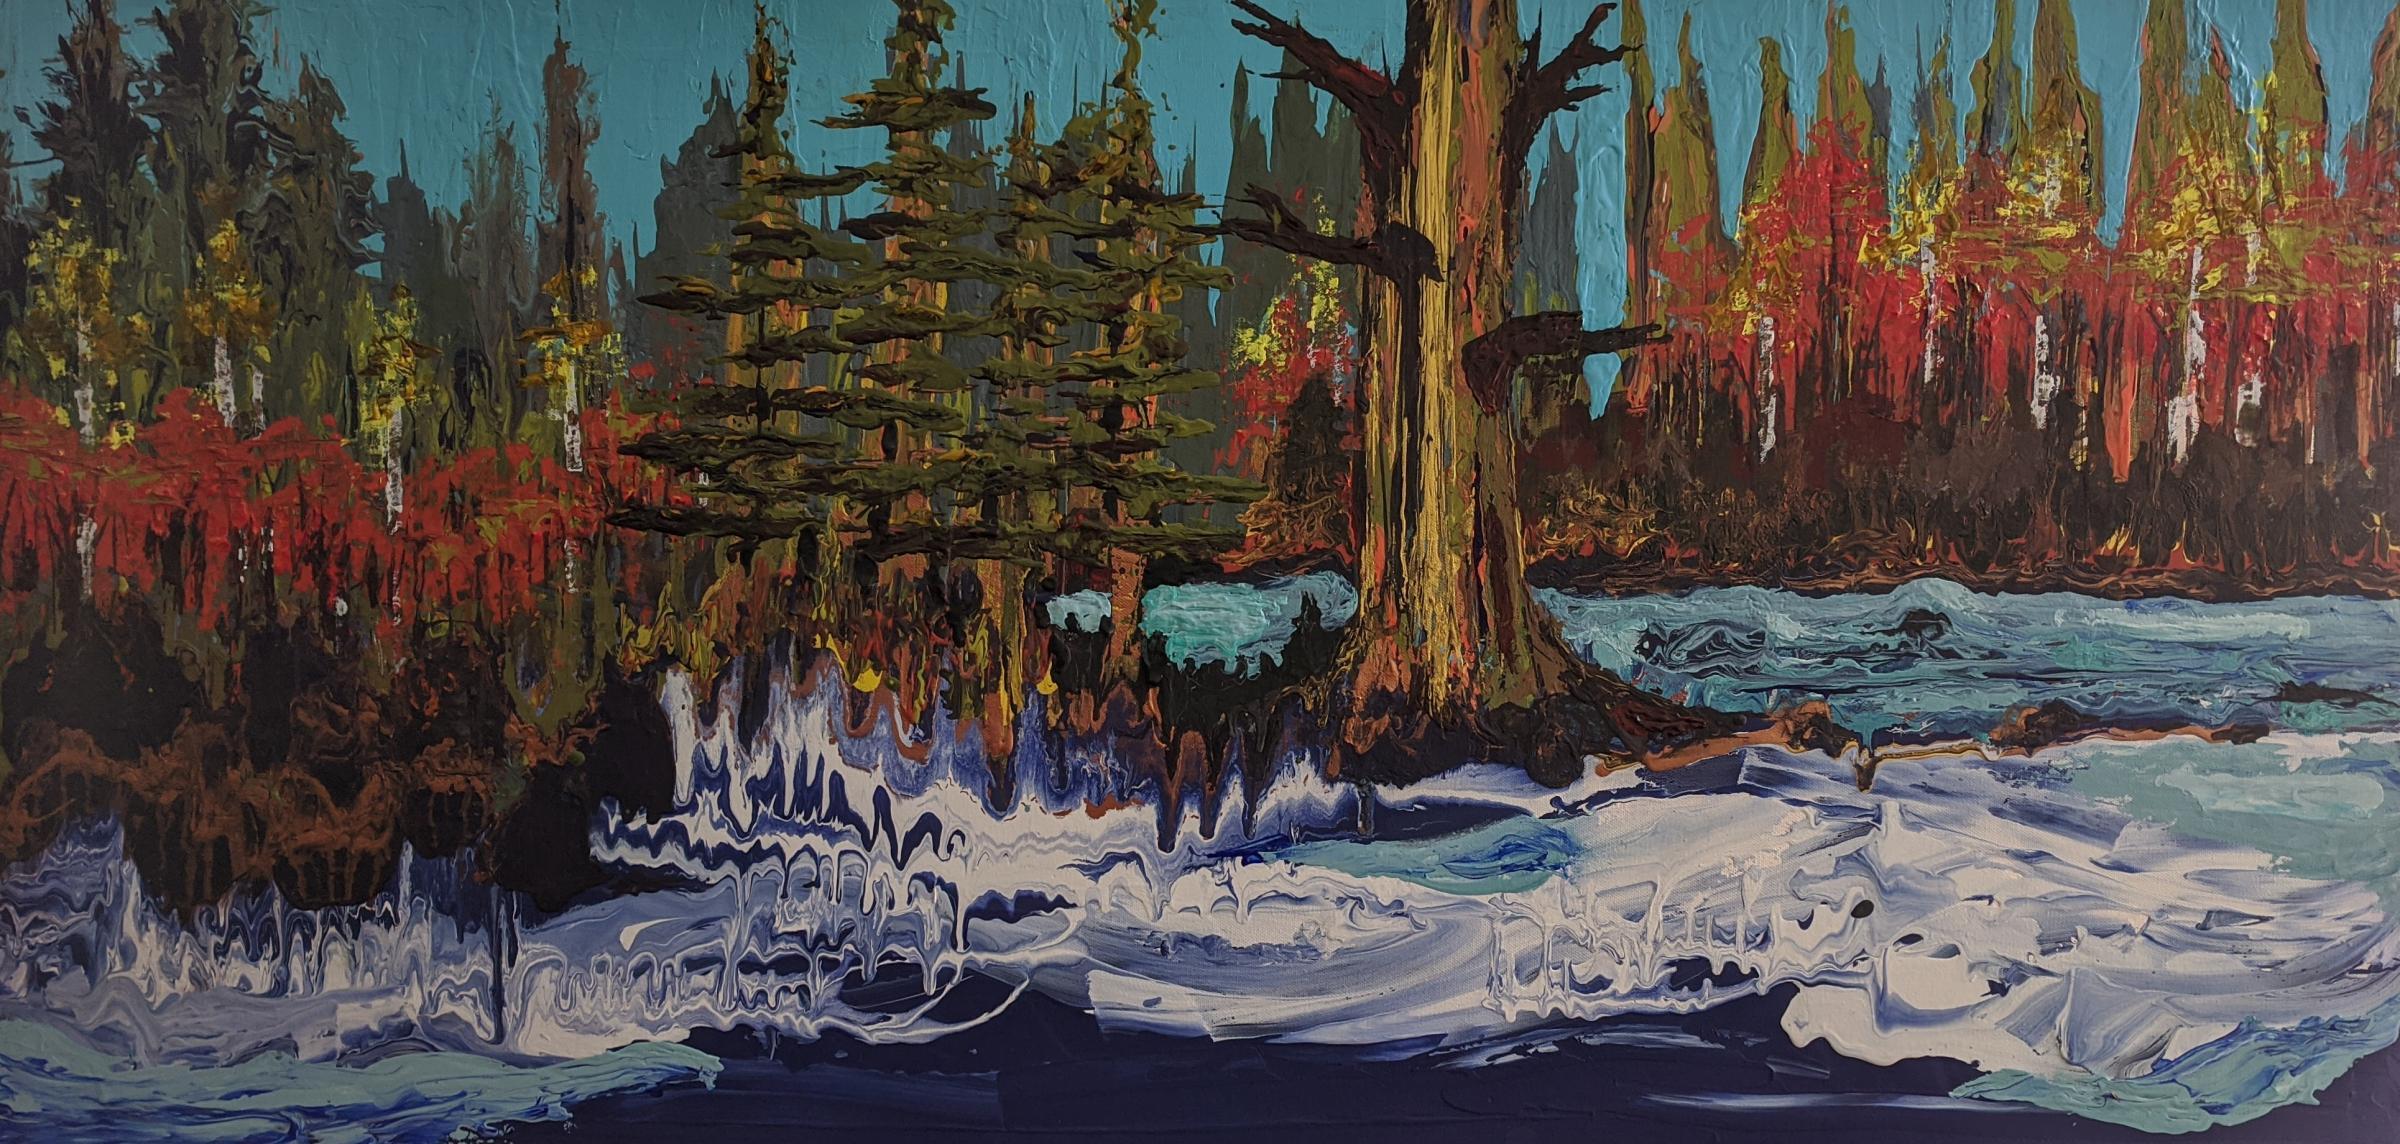 Bend in the River by Laurel B Pedersen